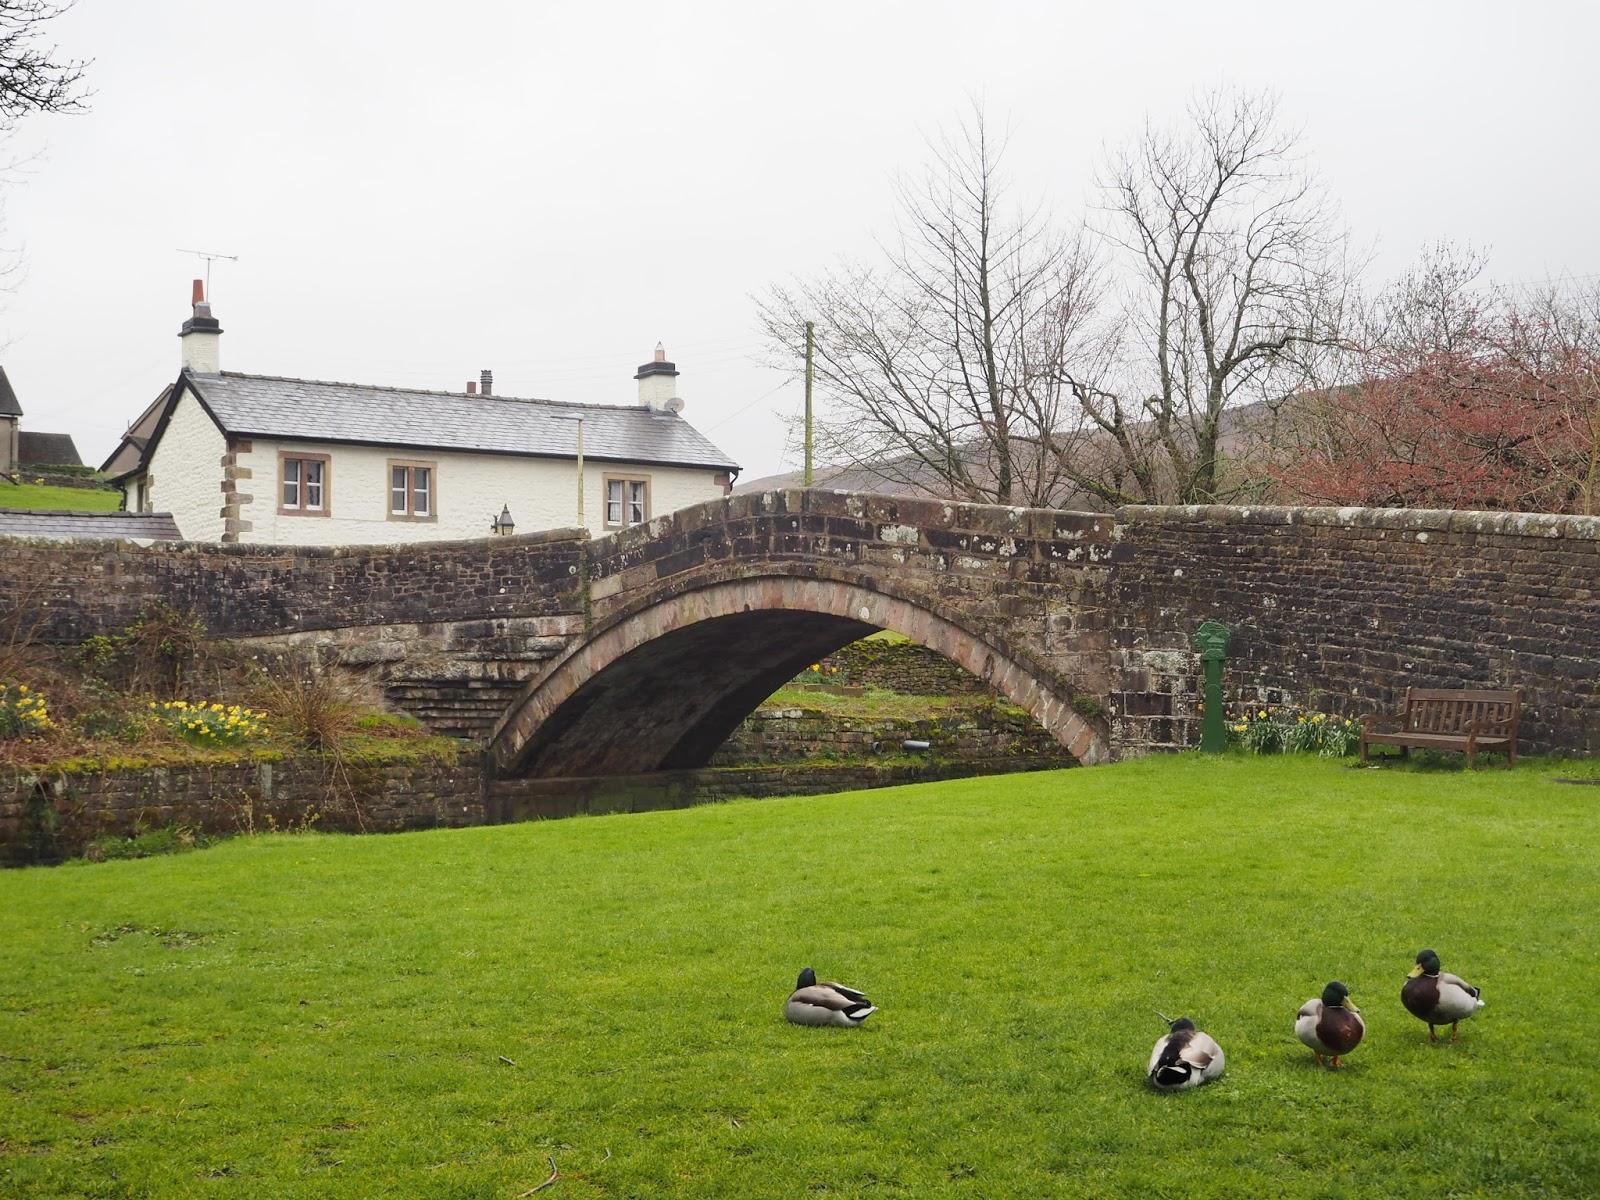 Ducks at Dunsop Bridge